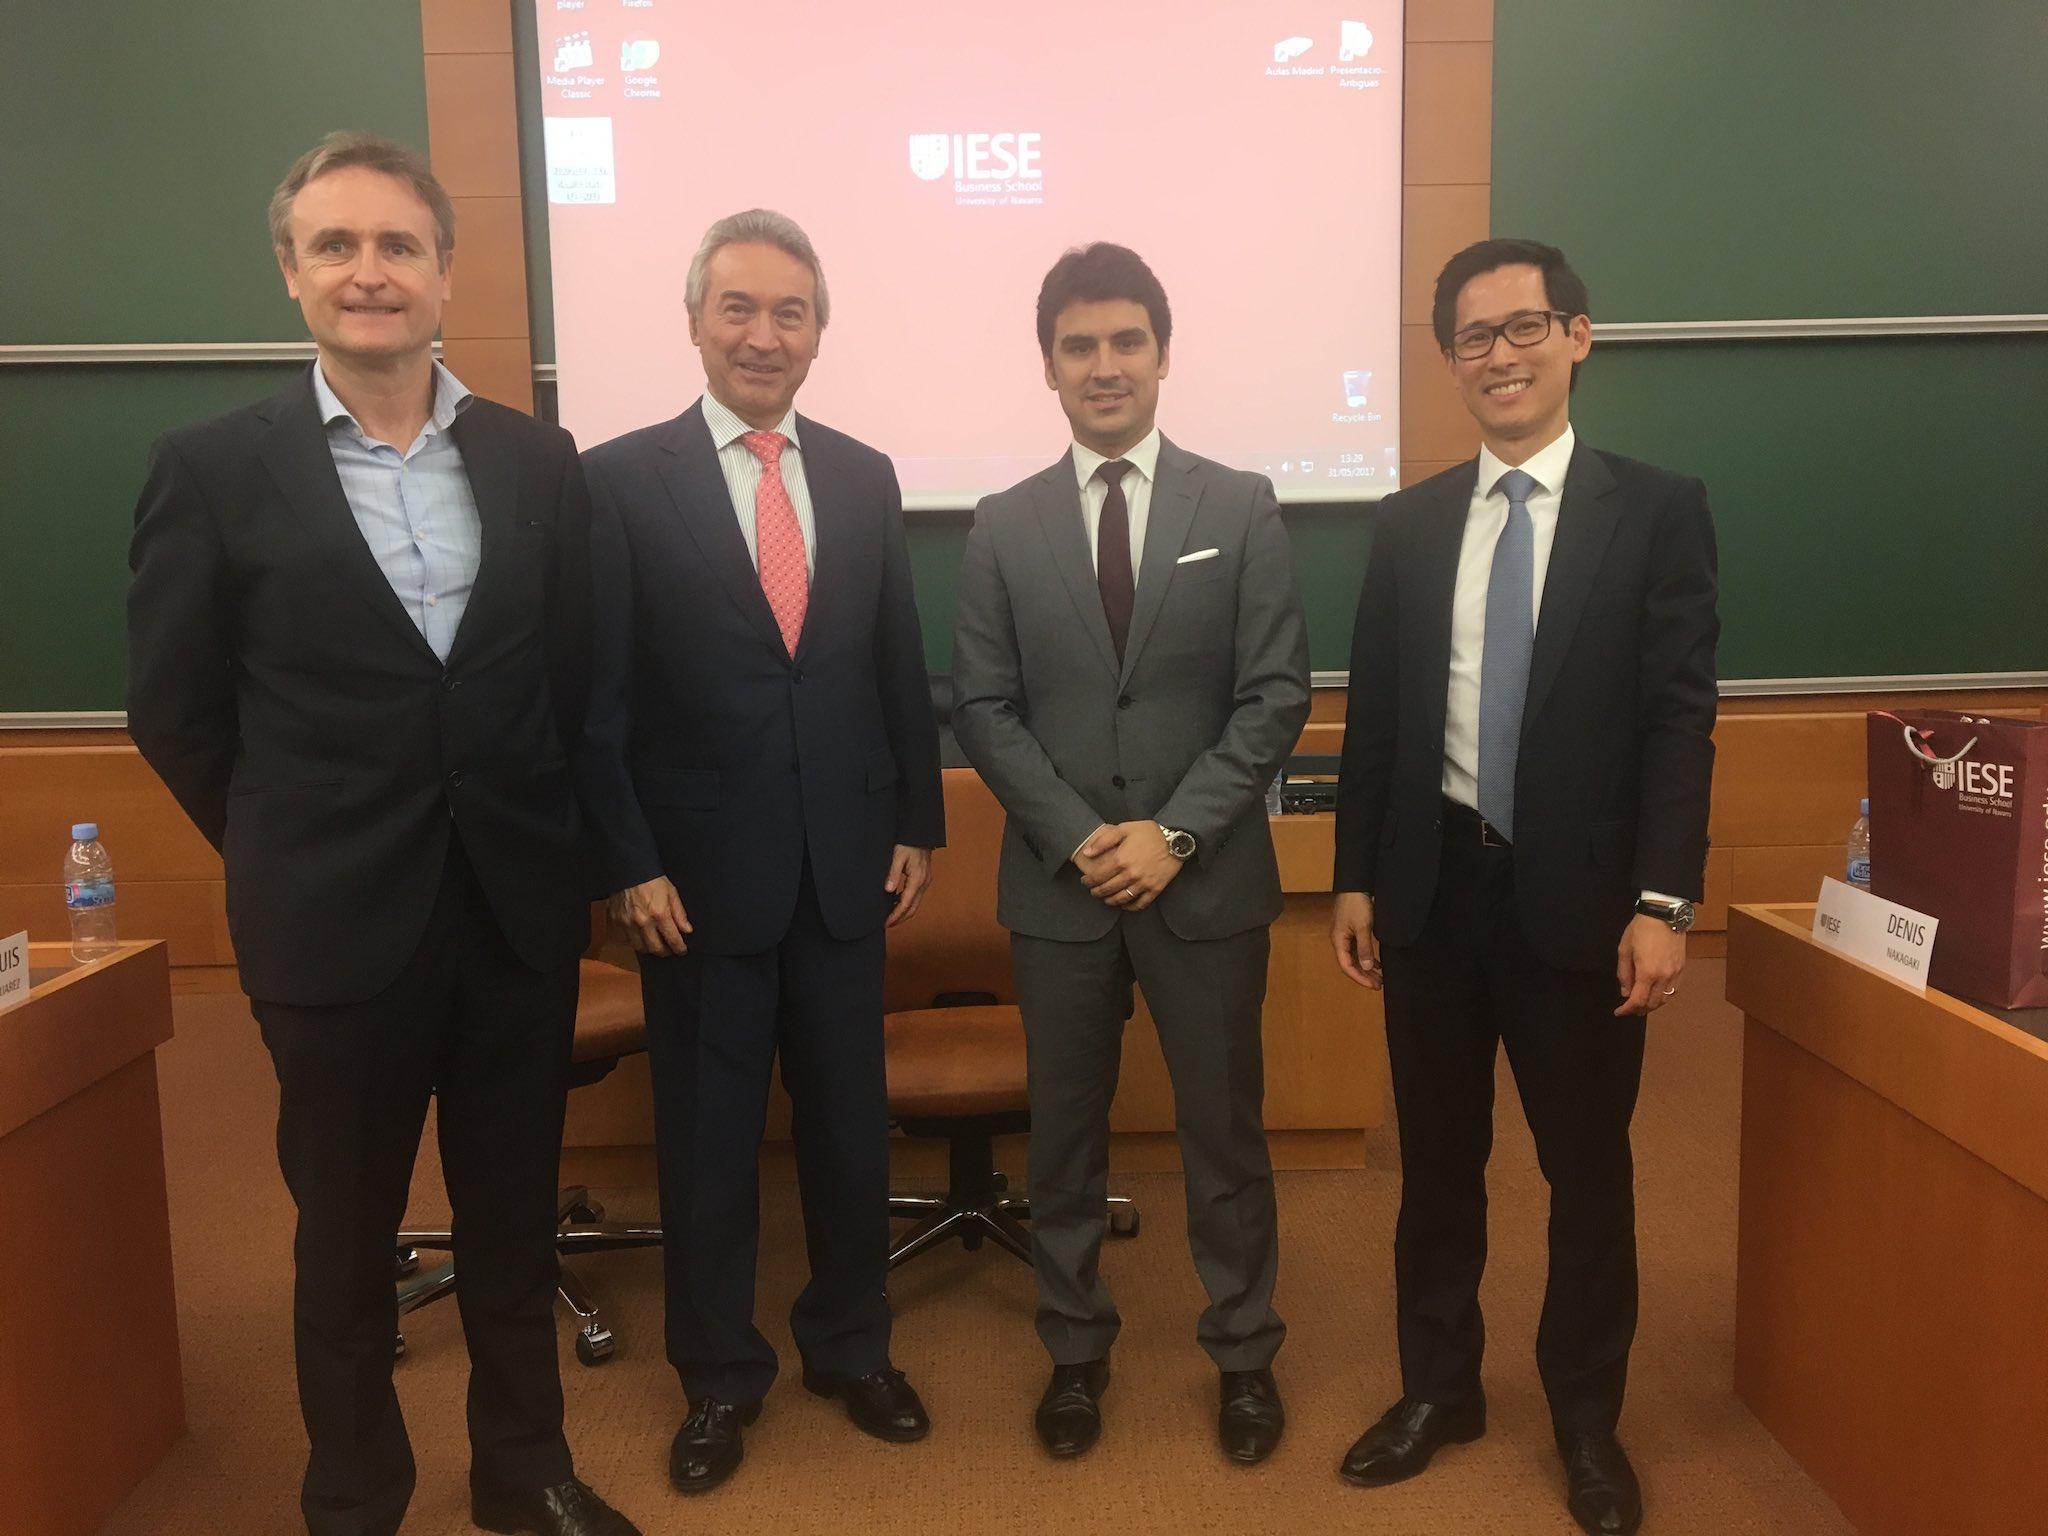 Expert panel discussion of Spanish housing market Left to right: Mark Stücklin (SPI), Prof. José Luis Suárez (IESE), Jordi Argemí (Neinor Homes), Denis Nakagaki (CaixaBank)